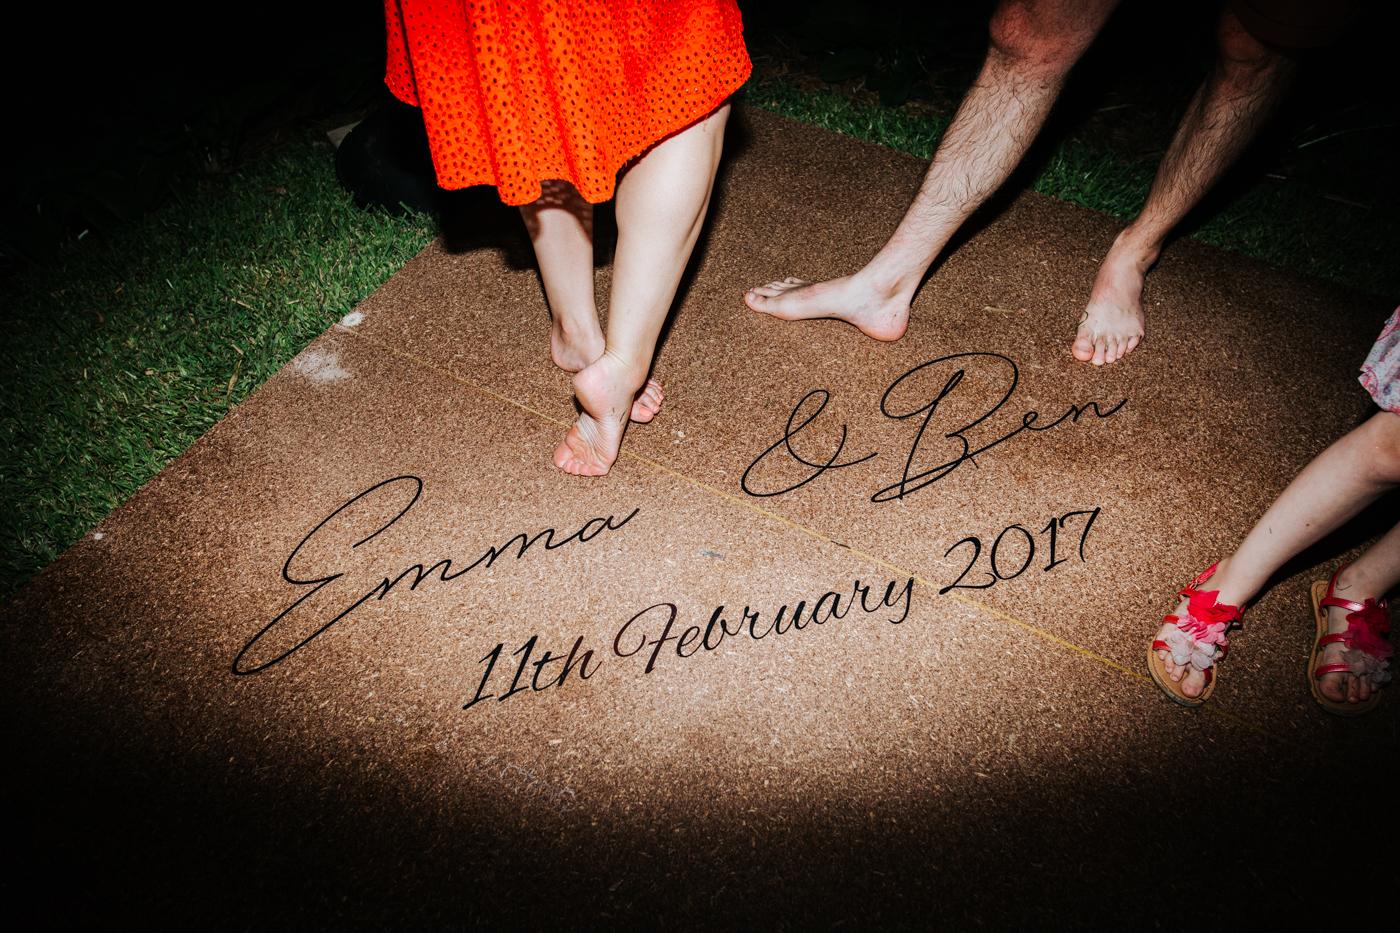 Emma & Ben - Lake Macquarie - Hunter Valley Wedding - Samantha Heather Photography-257.jpg